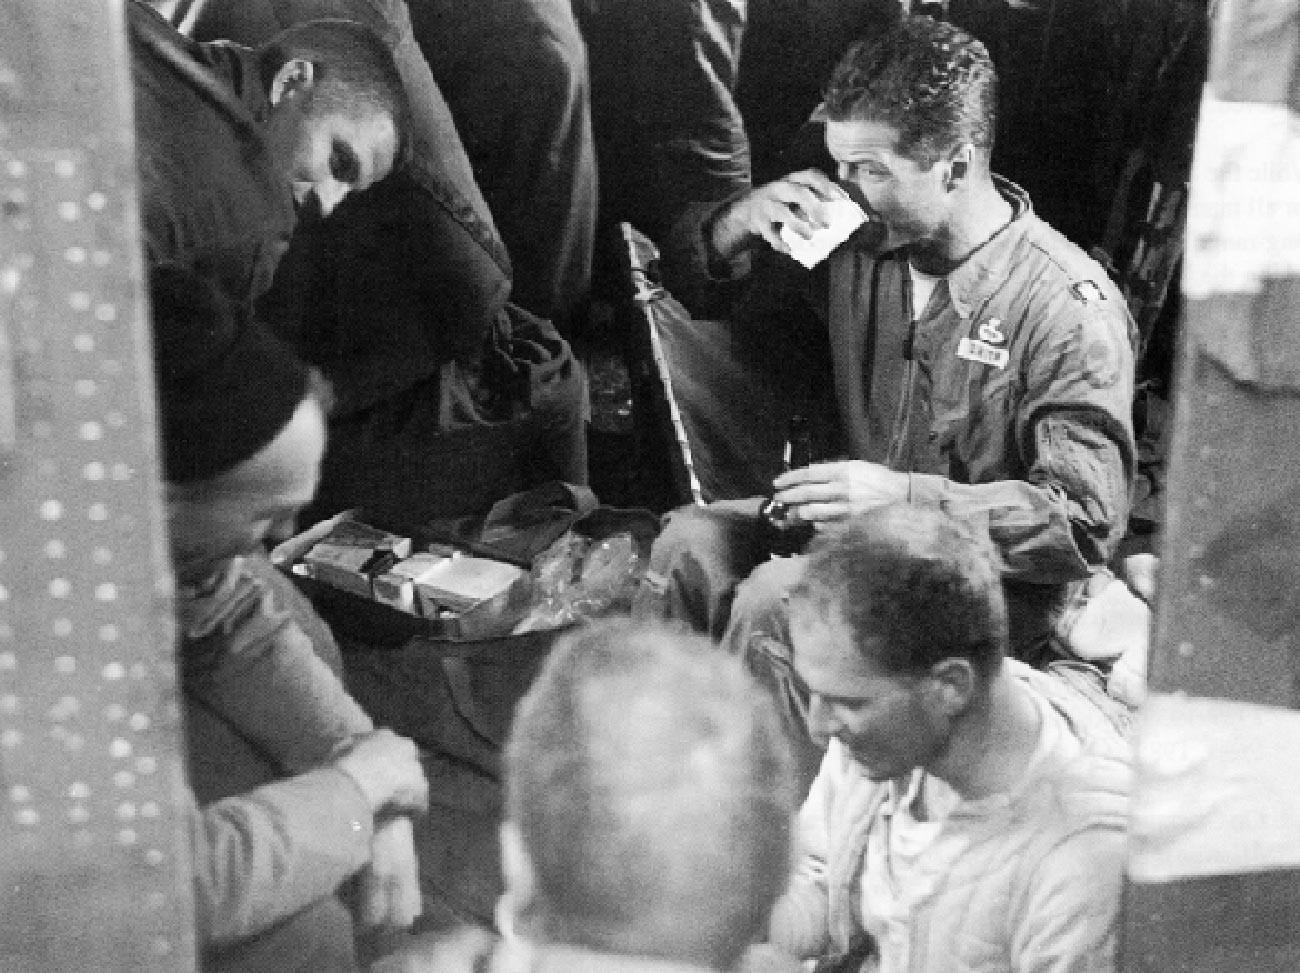 Major Smith on board Intermountain's B-17, 2 June 1962. Lieutenant LeShack is in the lower right corner.